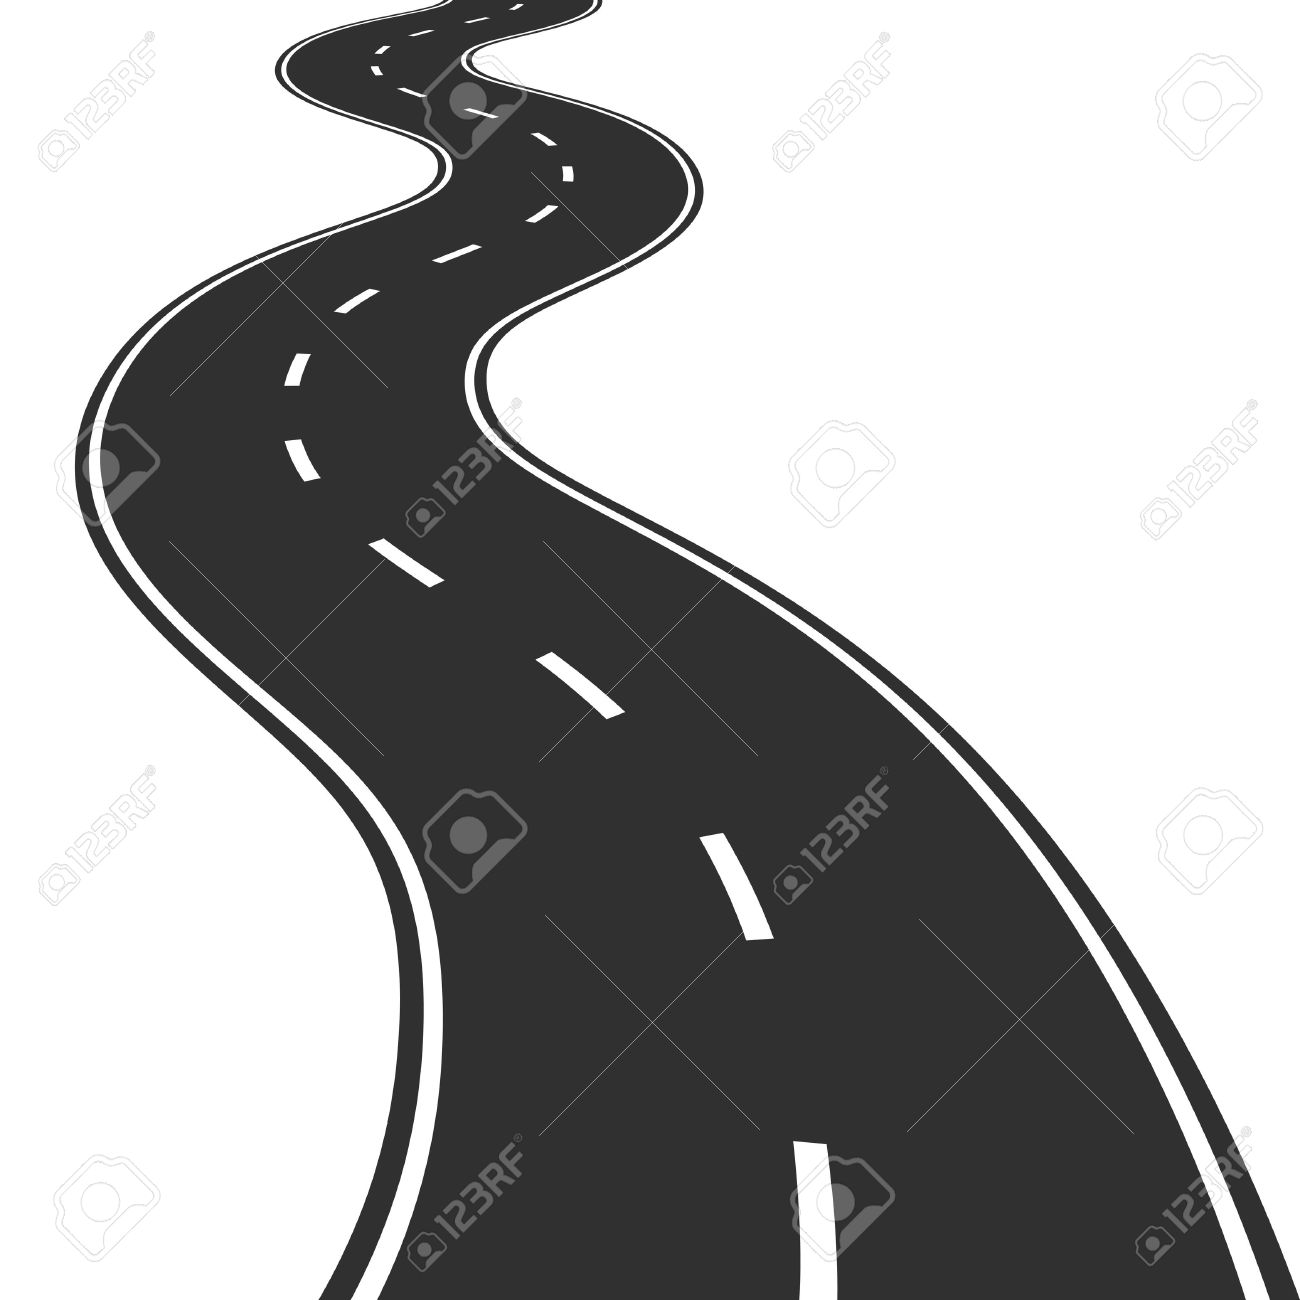 Illustration of winding road - 20008432